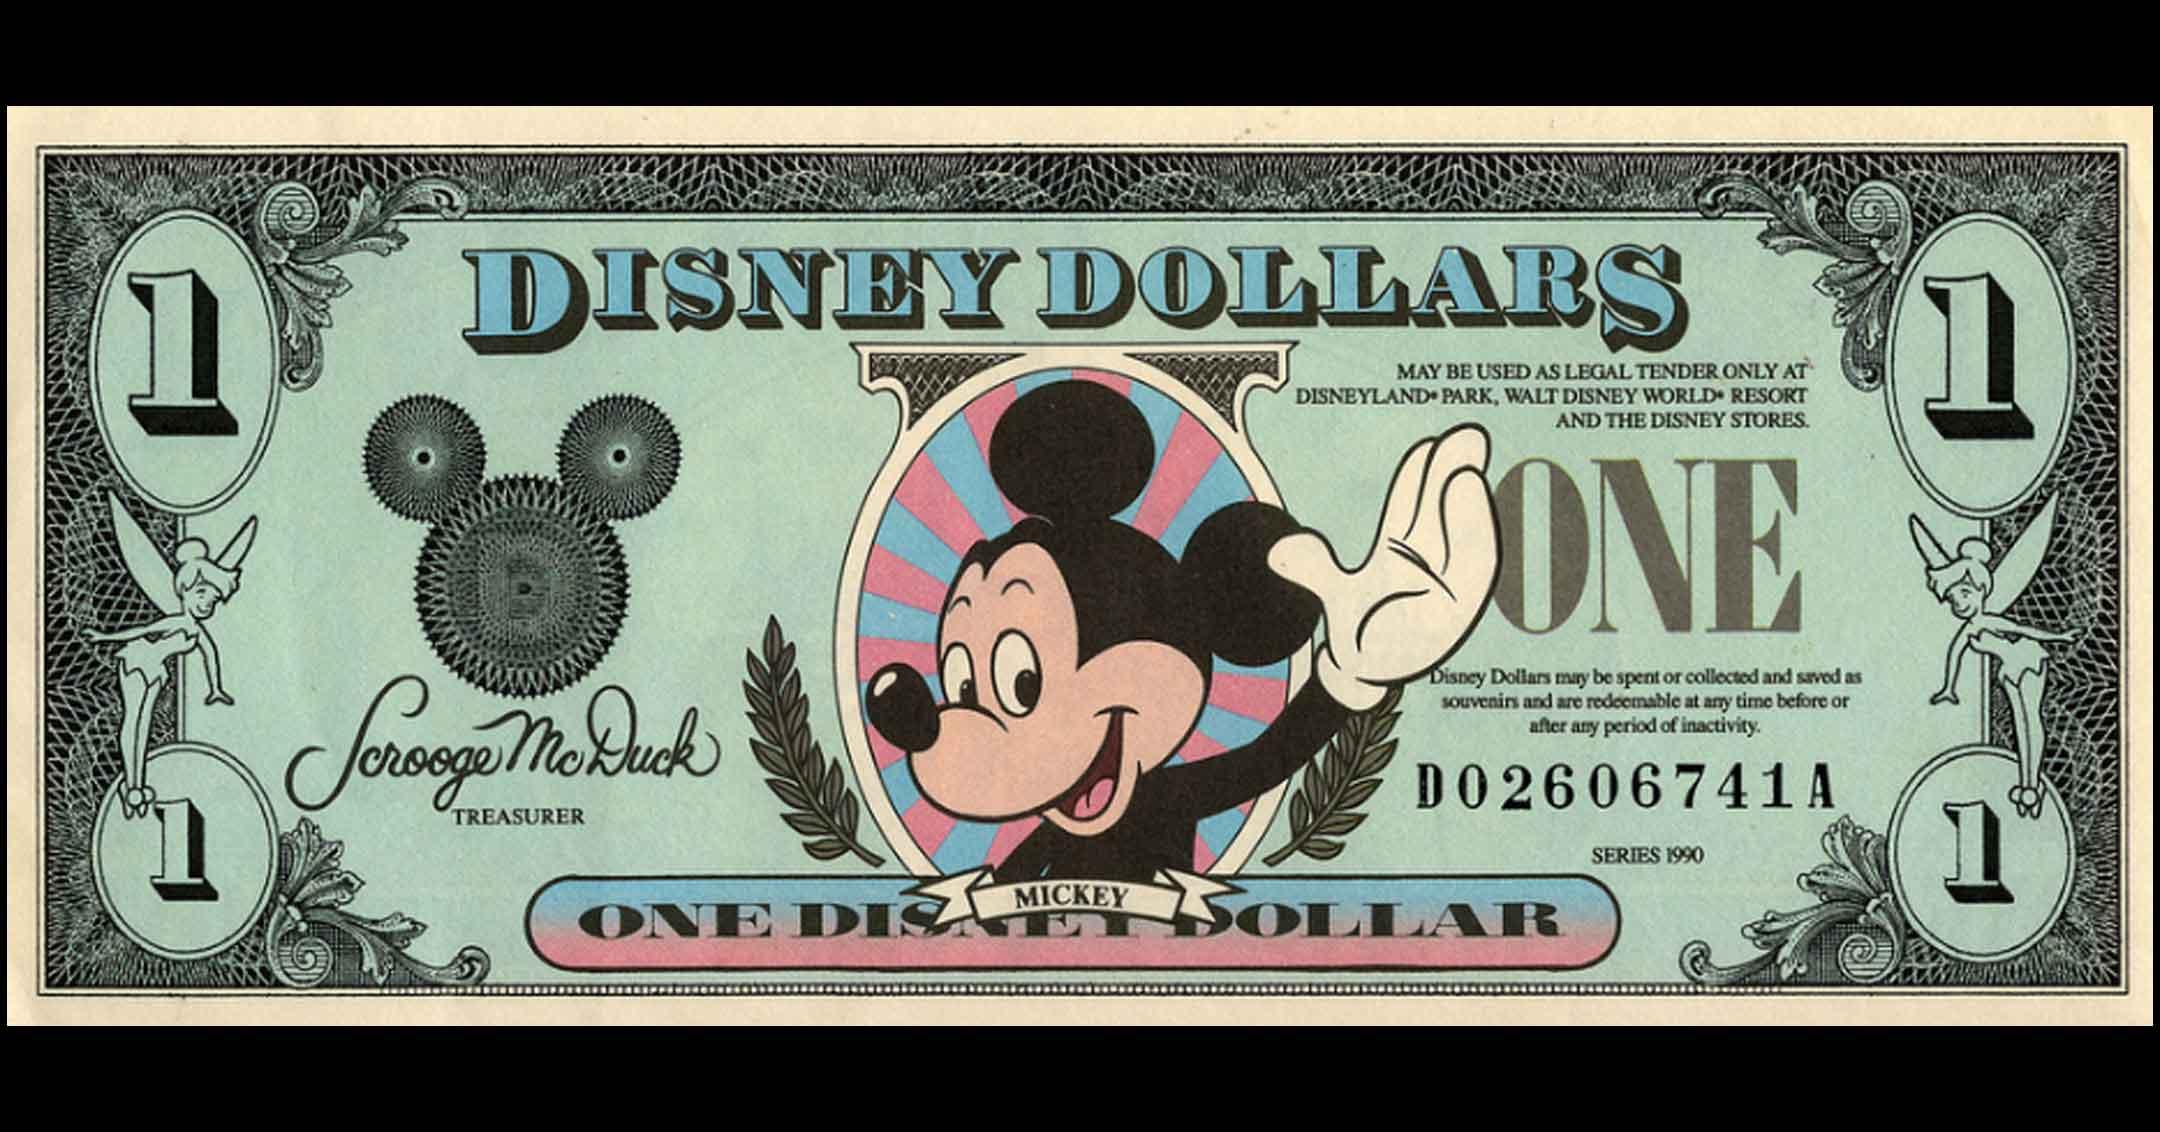 Disney Dollars | DaveTavres.com